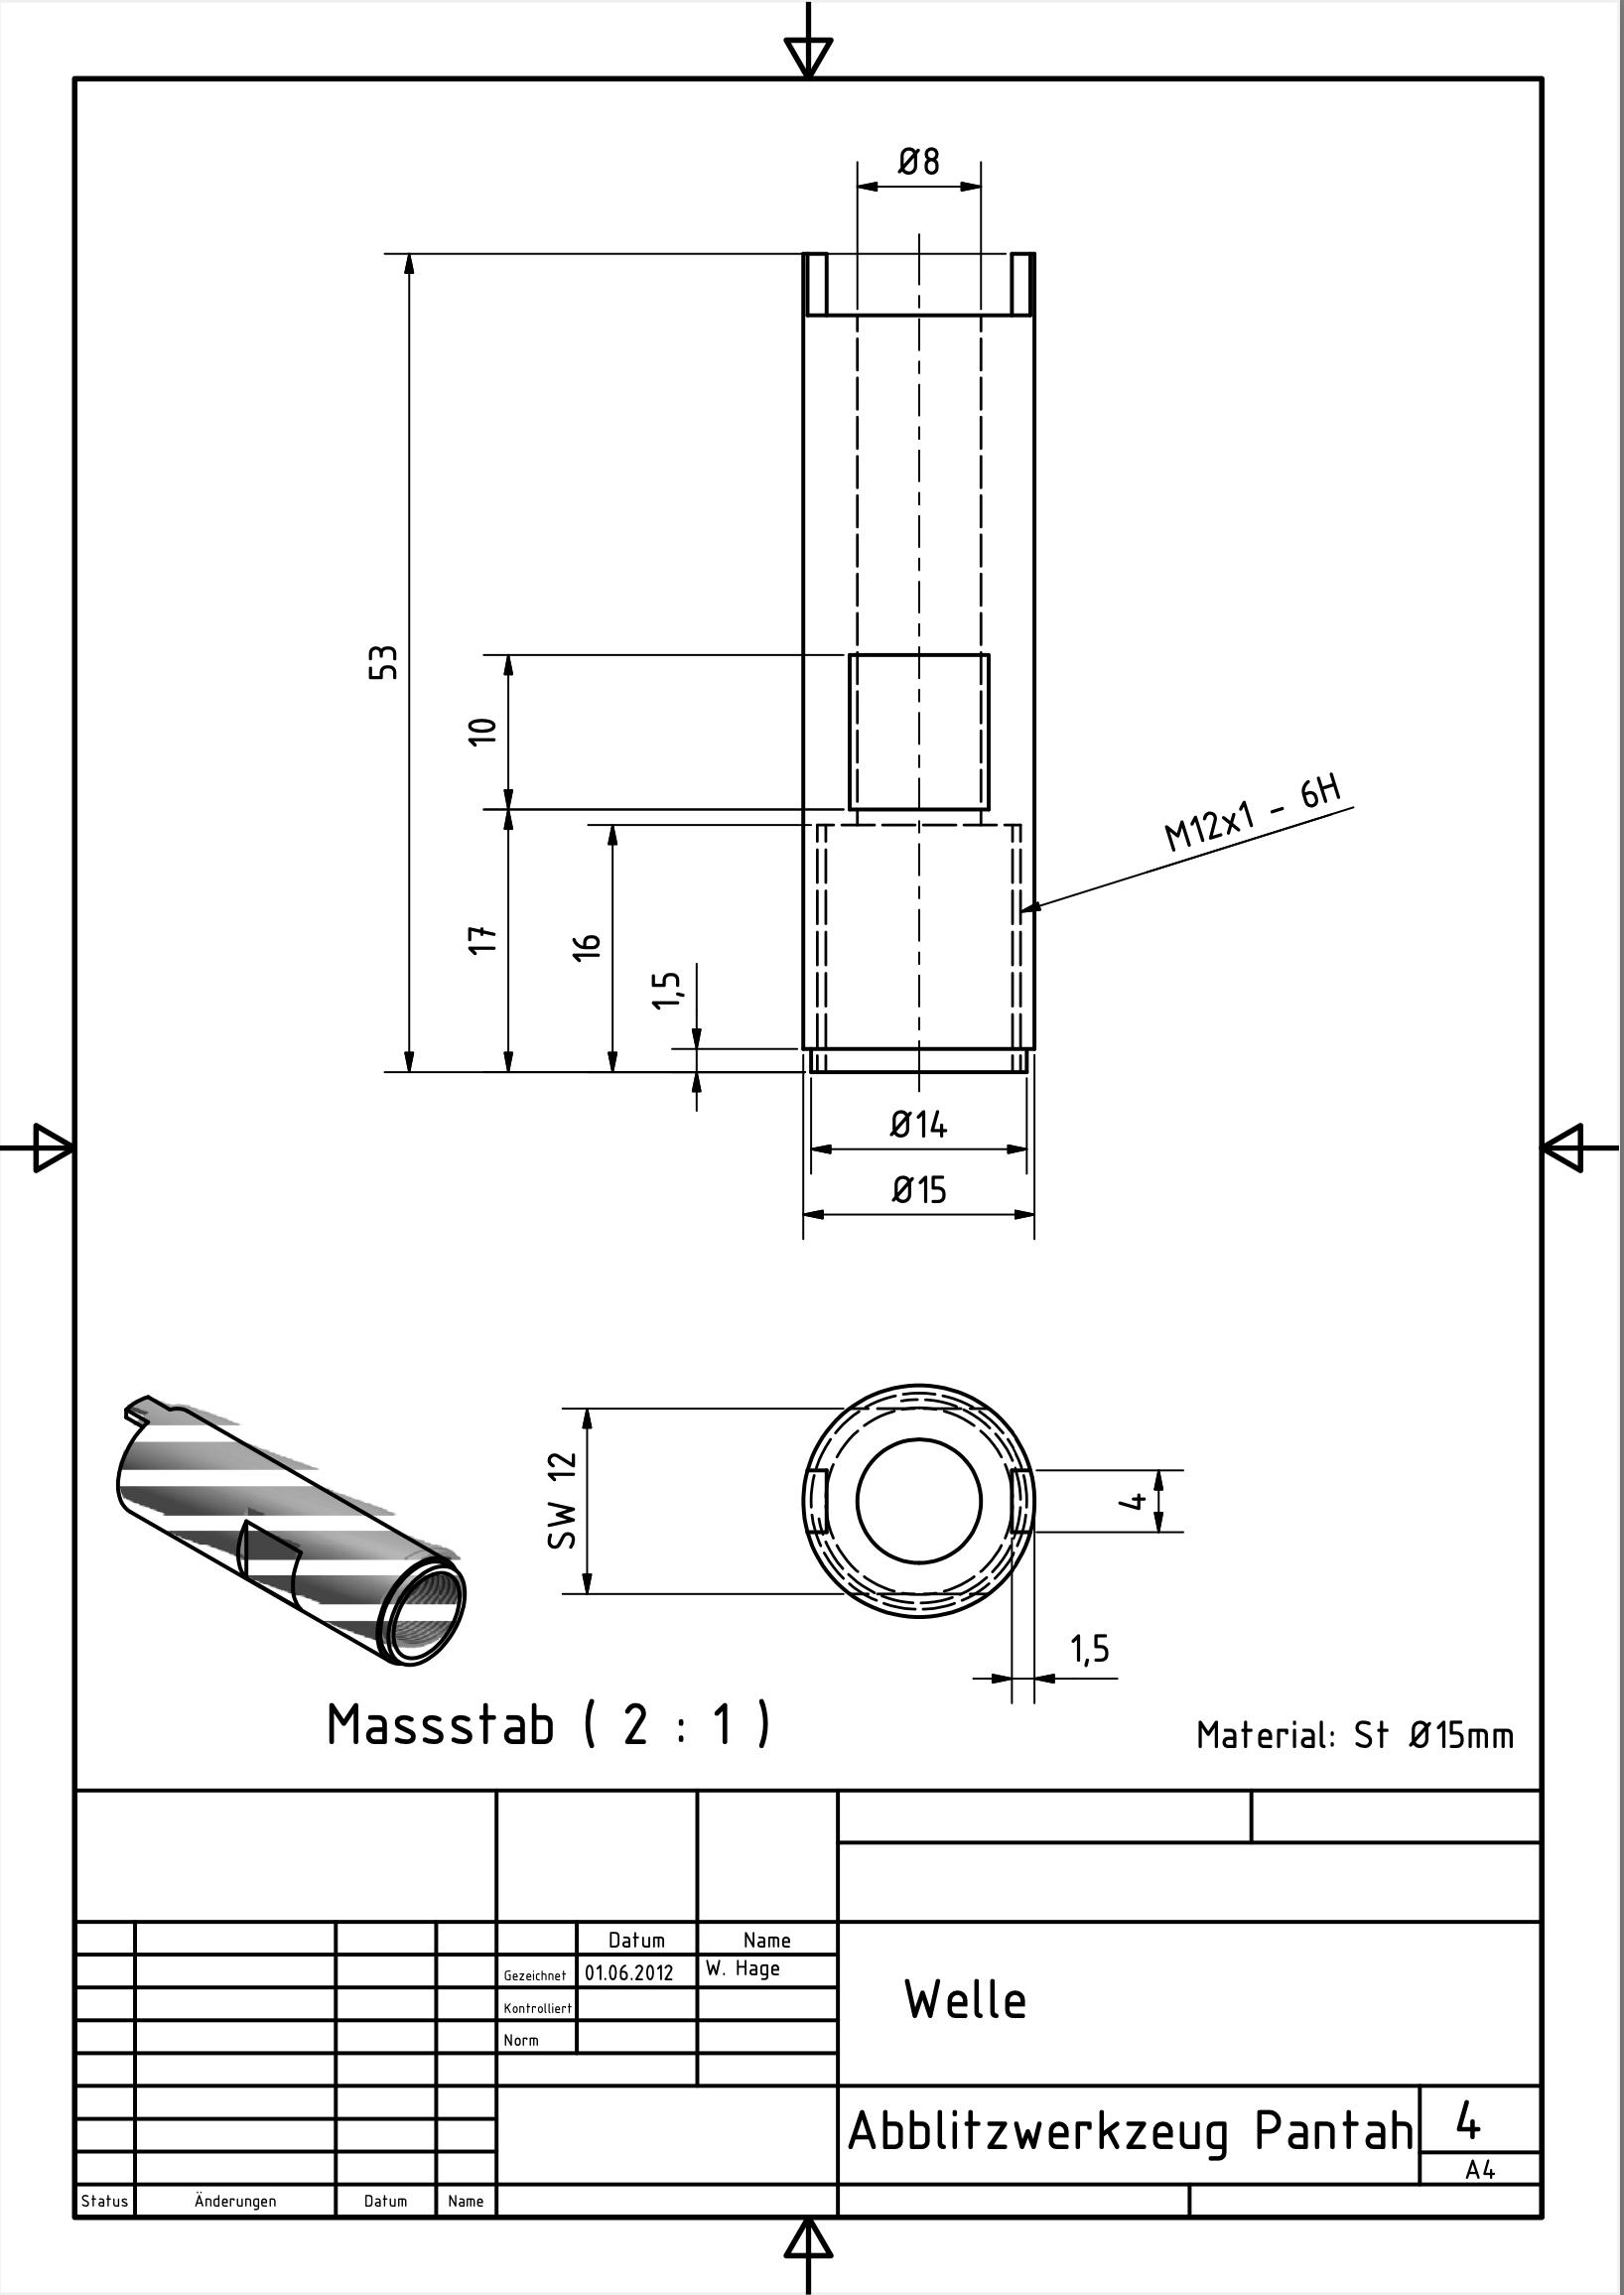 Abblitzwerkzeug Pantah 4